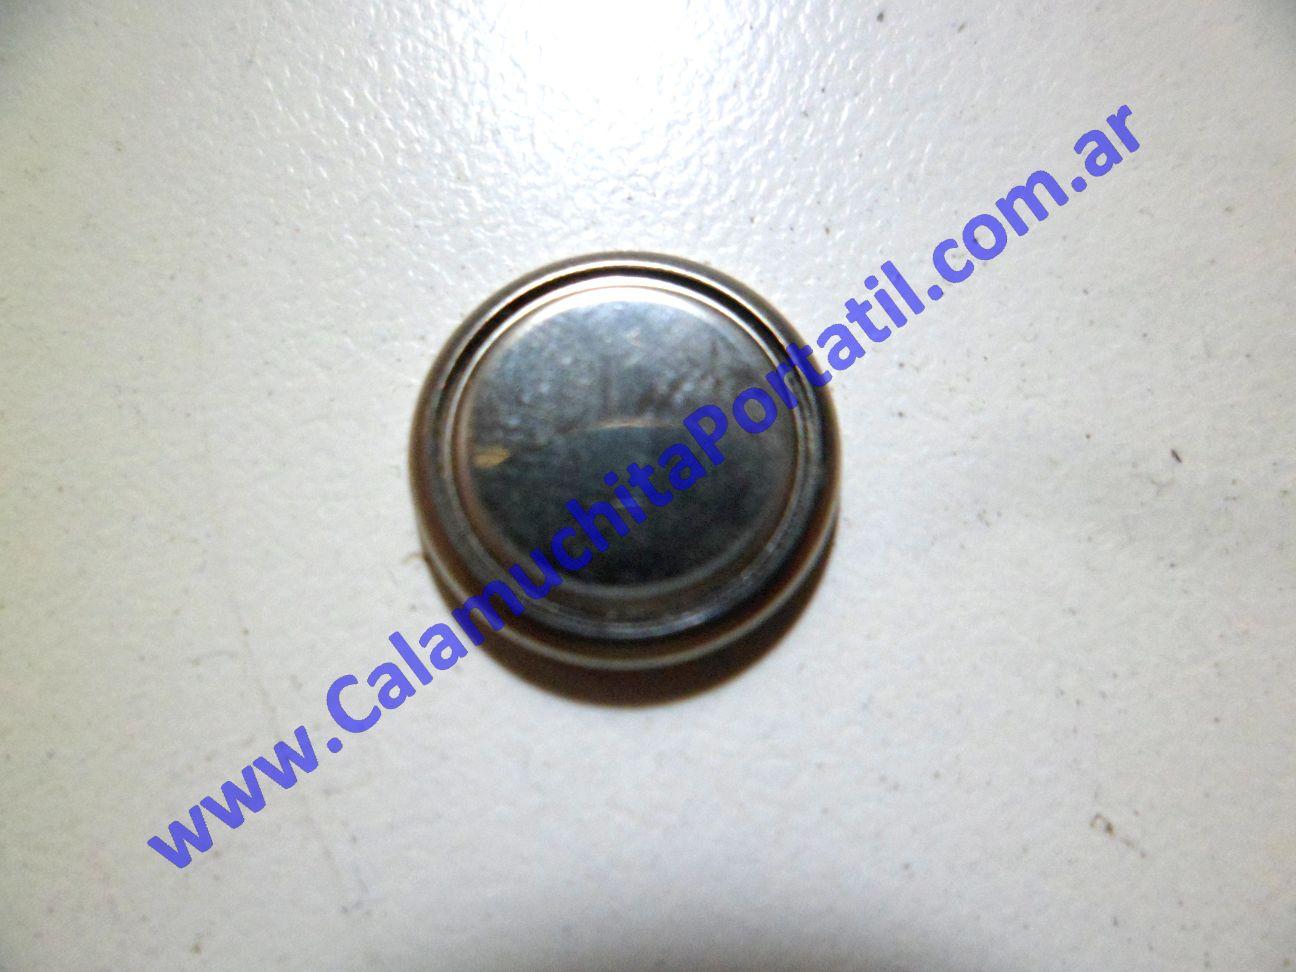 0091YPI Pila Compaq Presario 2100 / 2190US